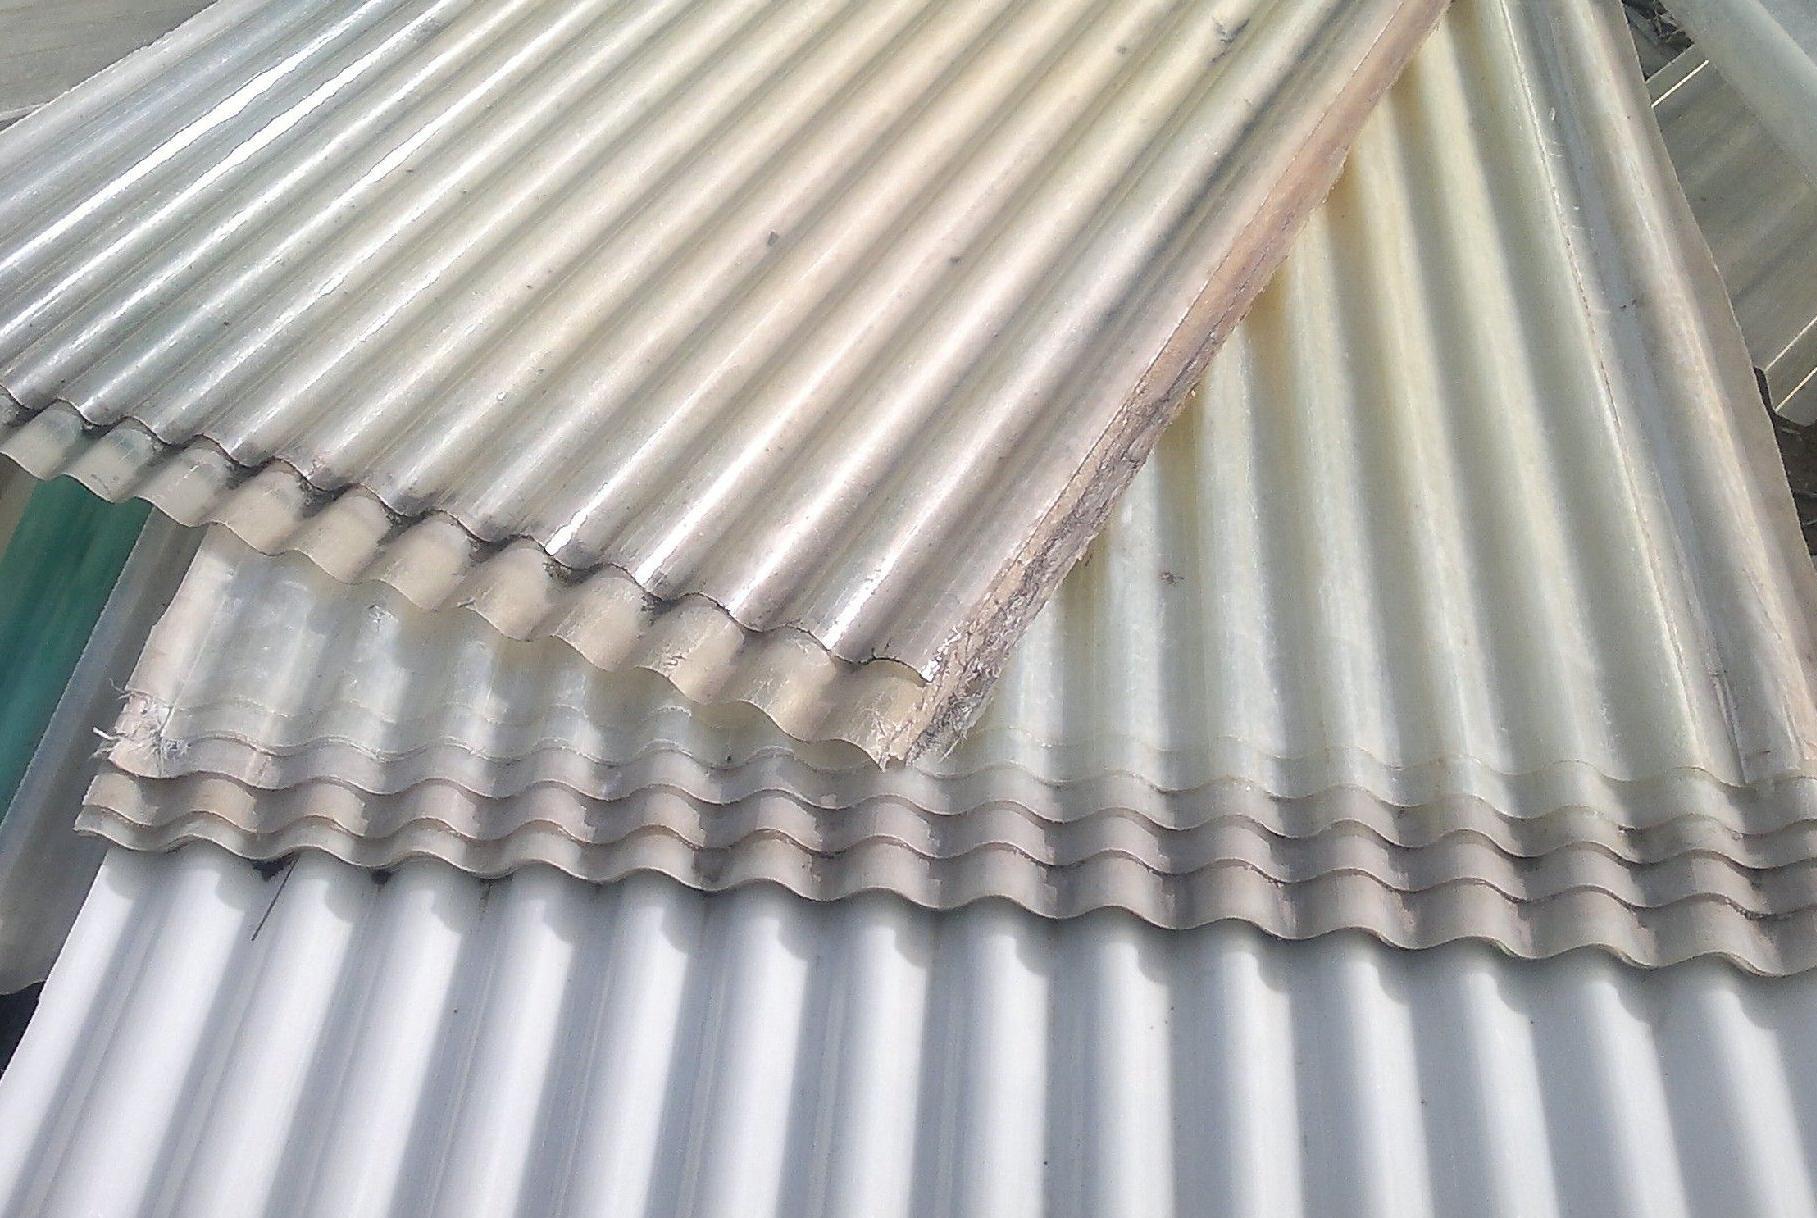 placas de poliester albacete placas de tejado chapas de